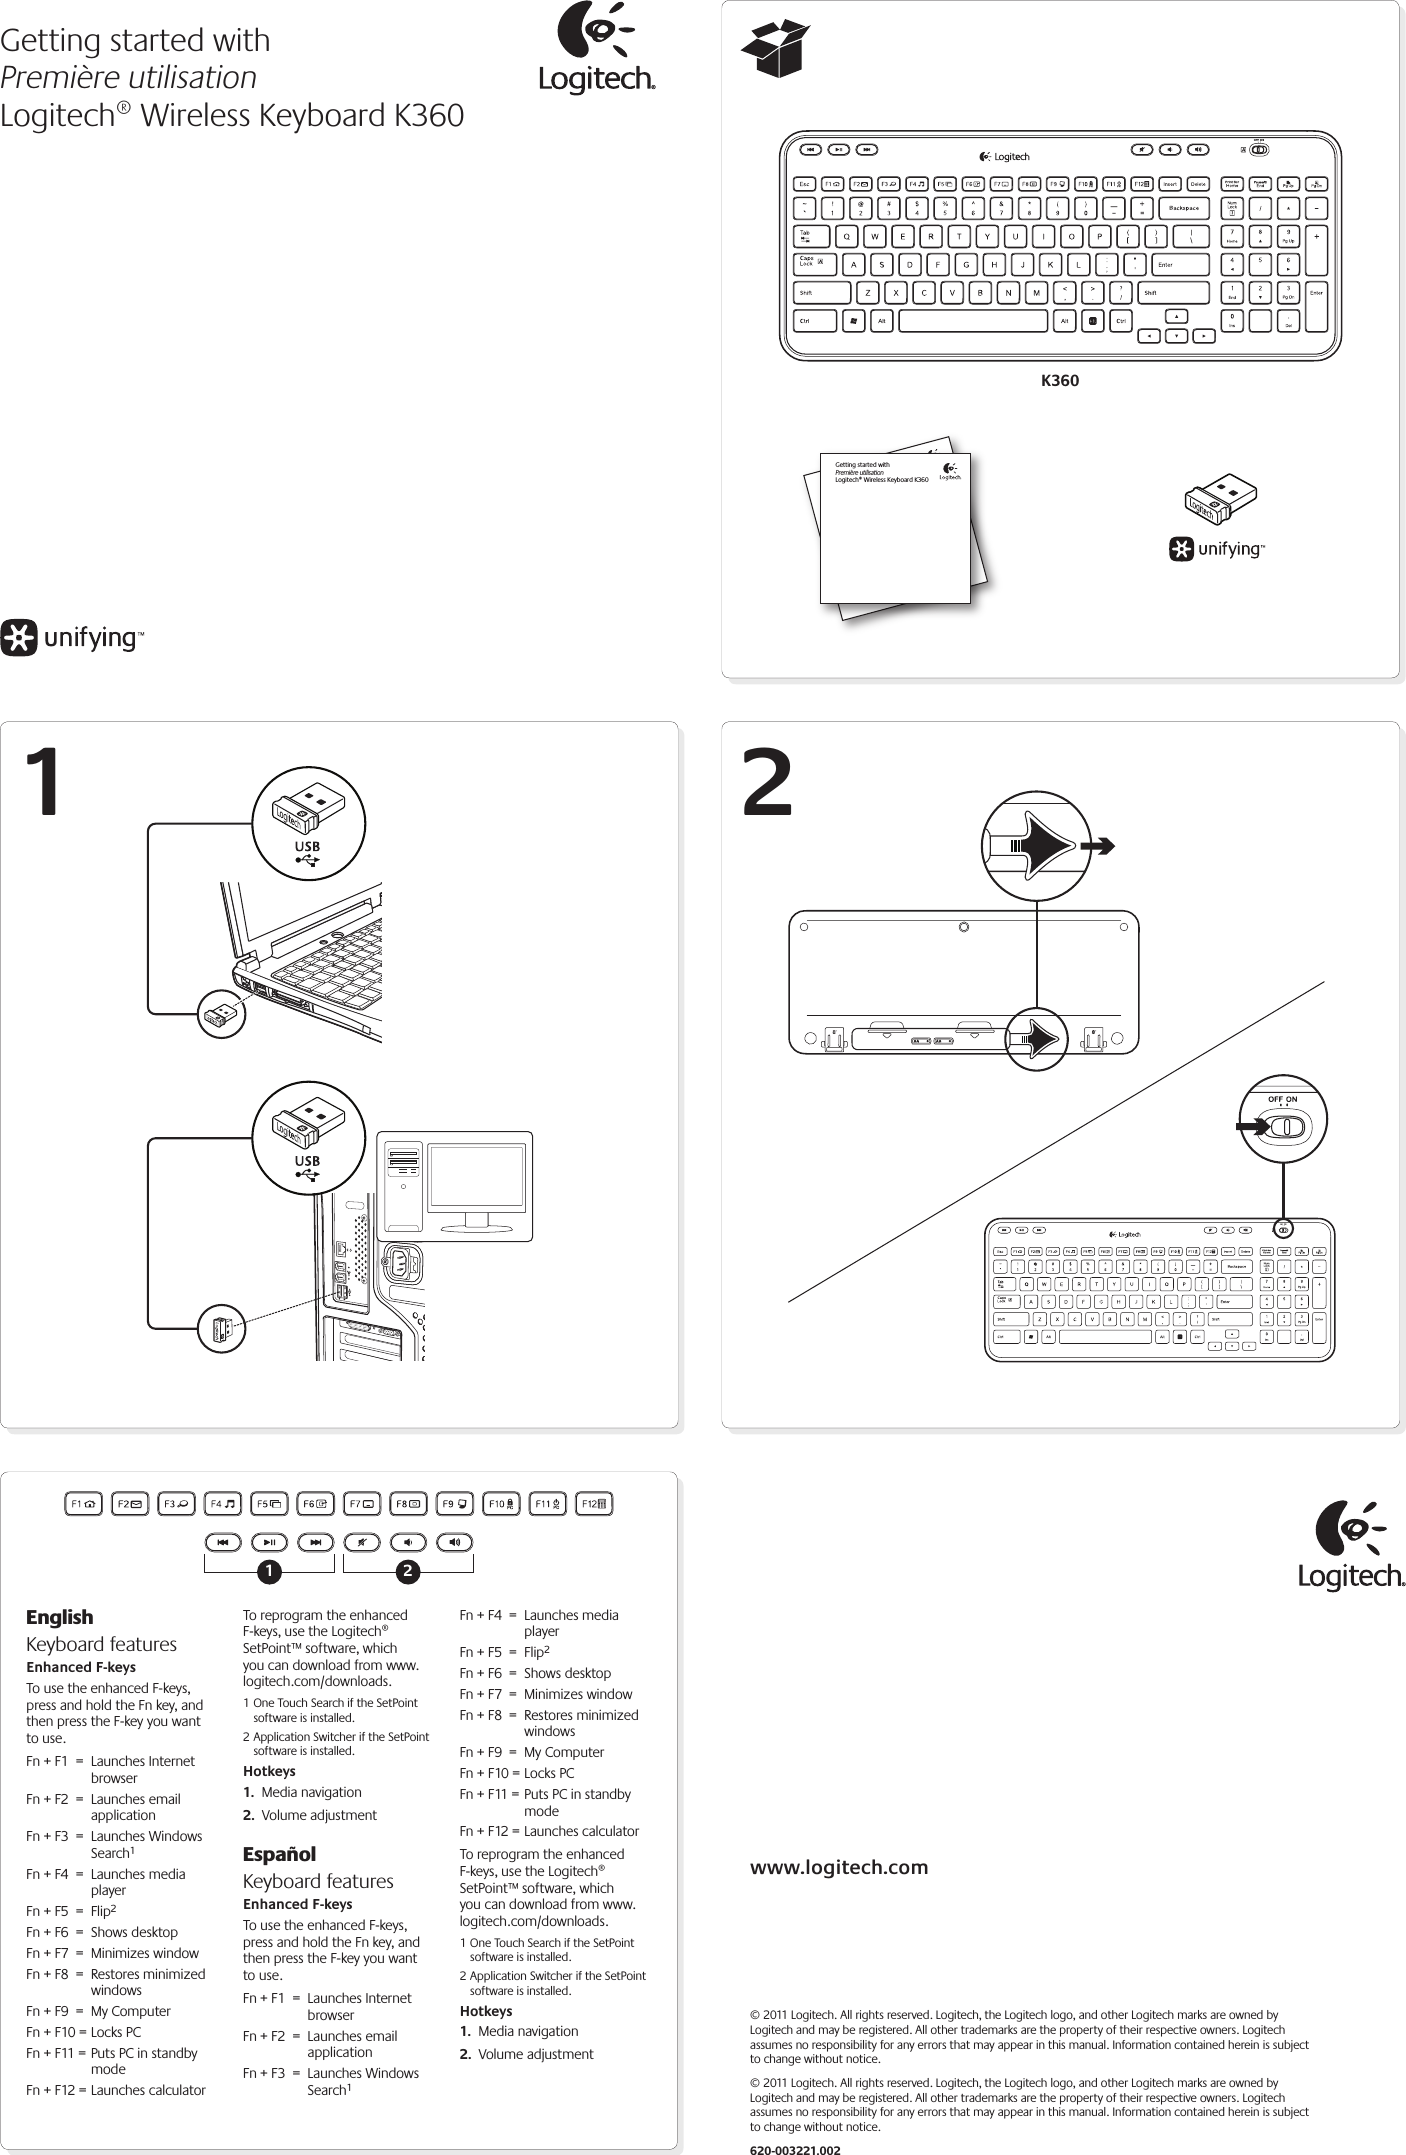 logitech far east yr0017 2 4ghz cordless keyboard user manual rh usermanual wiki Logitech Cordless Keyboard and Mouse Combo Logitech Cordless Optical Mouse Drivers